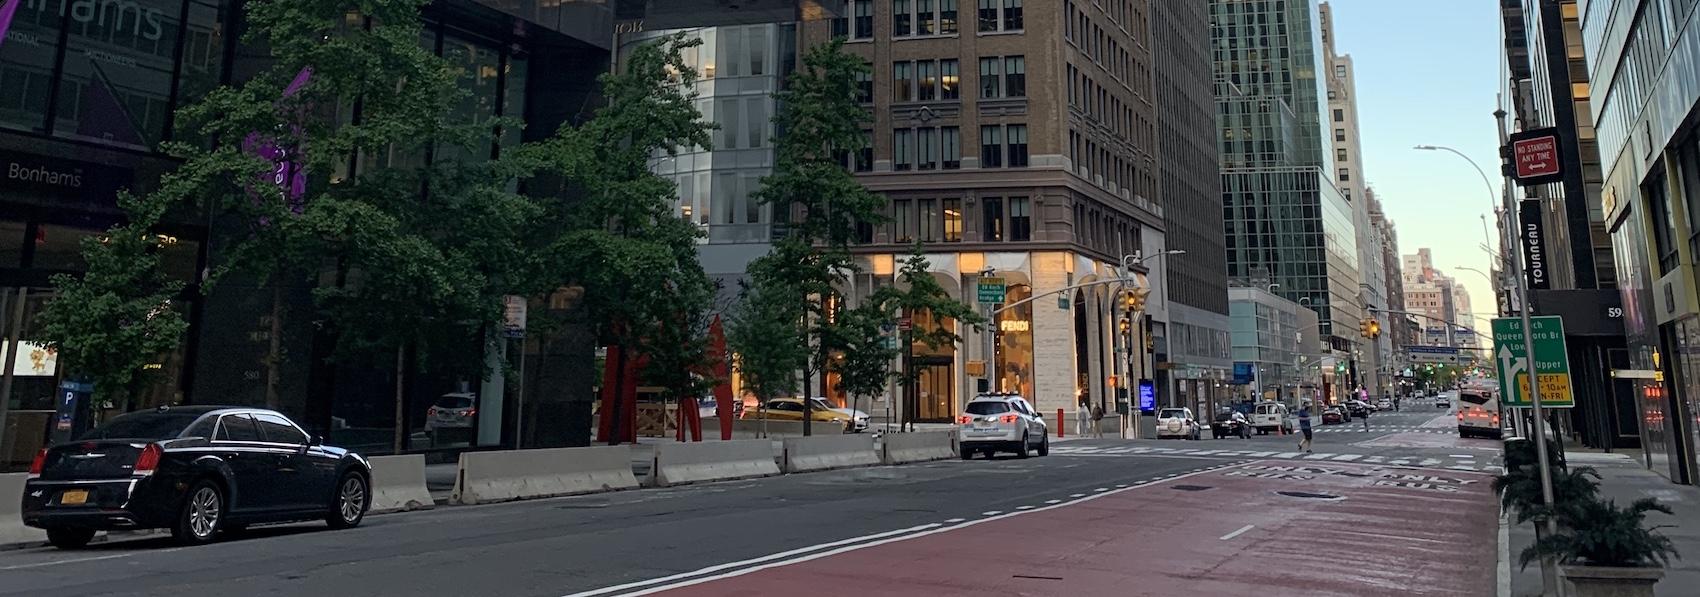 Adrienne Bankert NYC Photo3